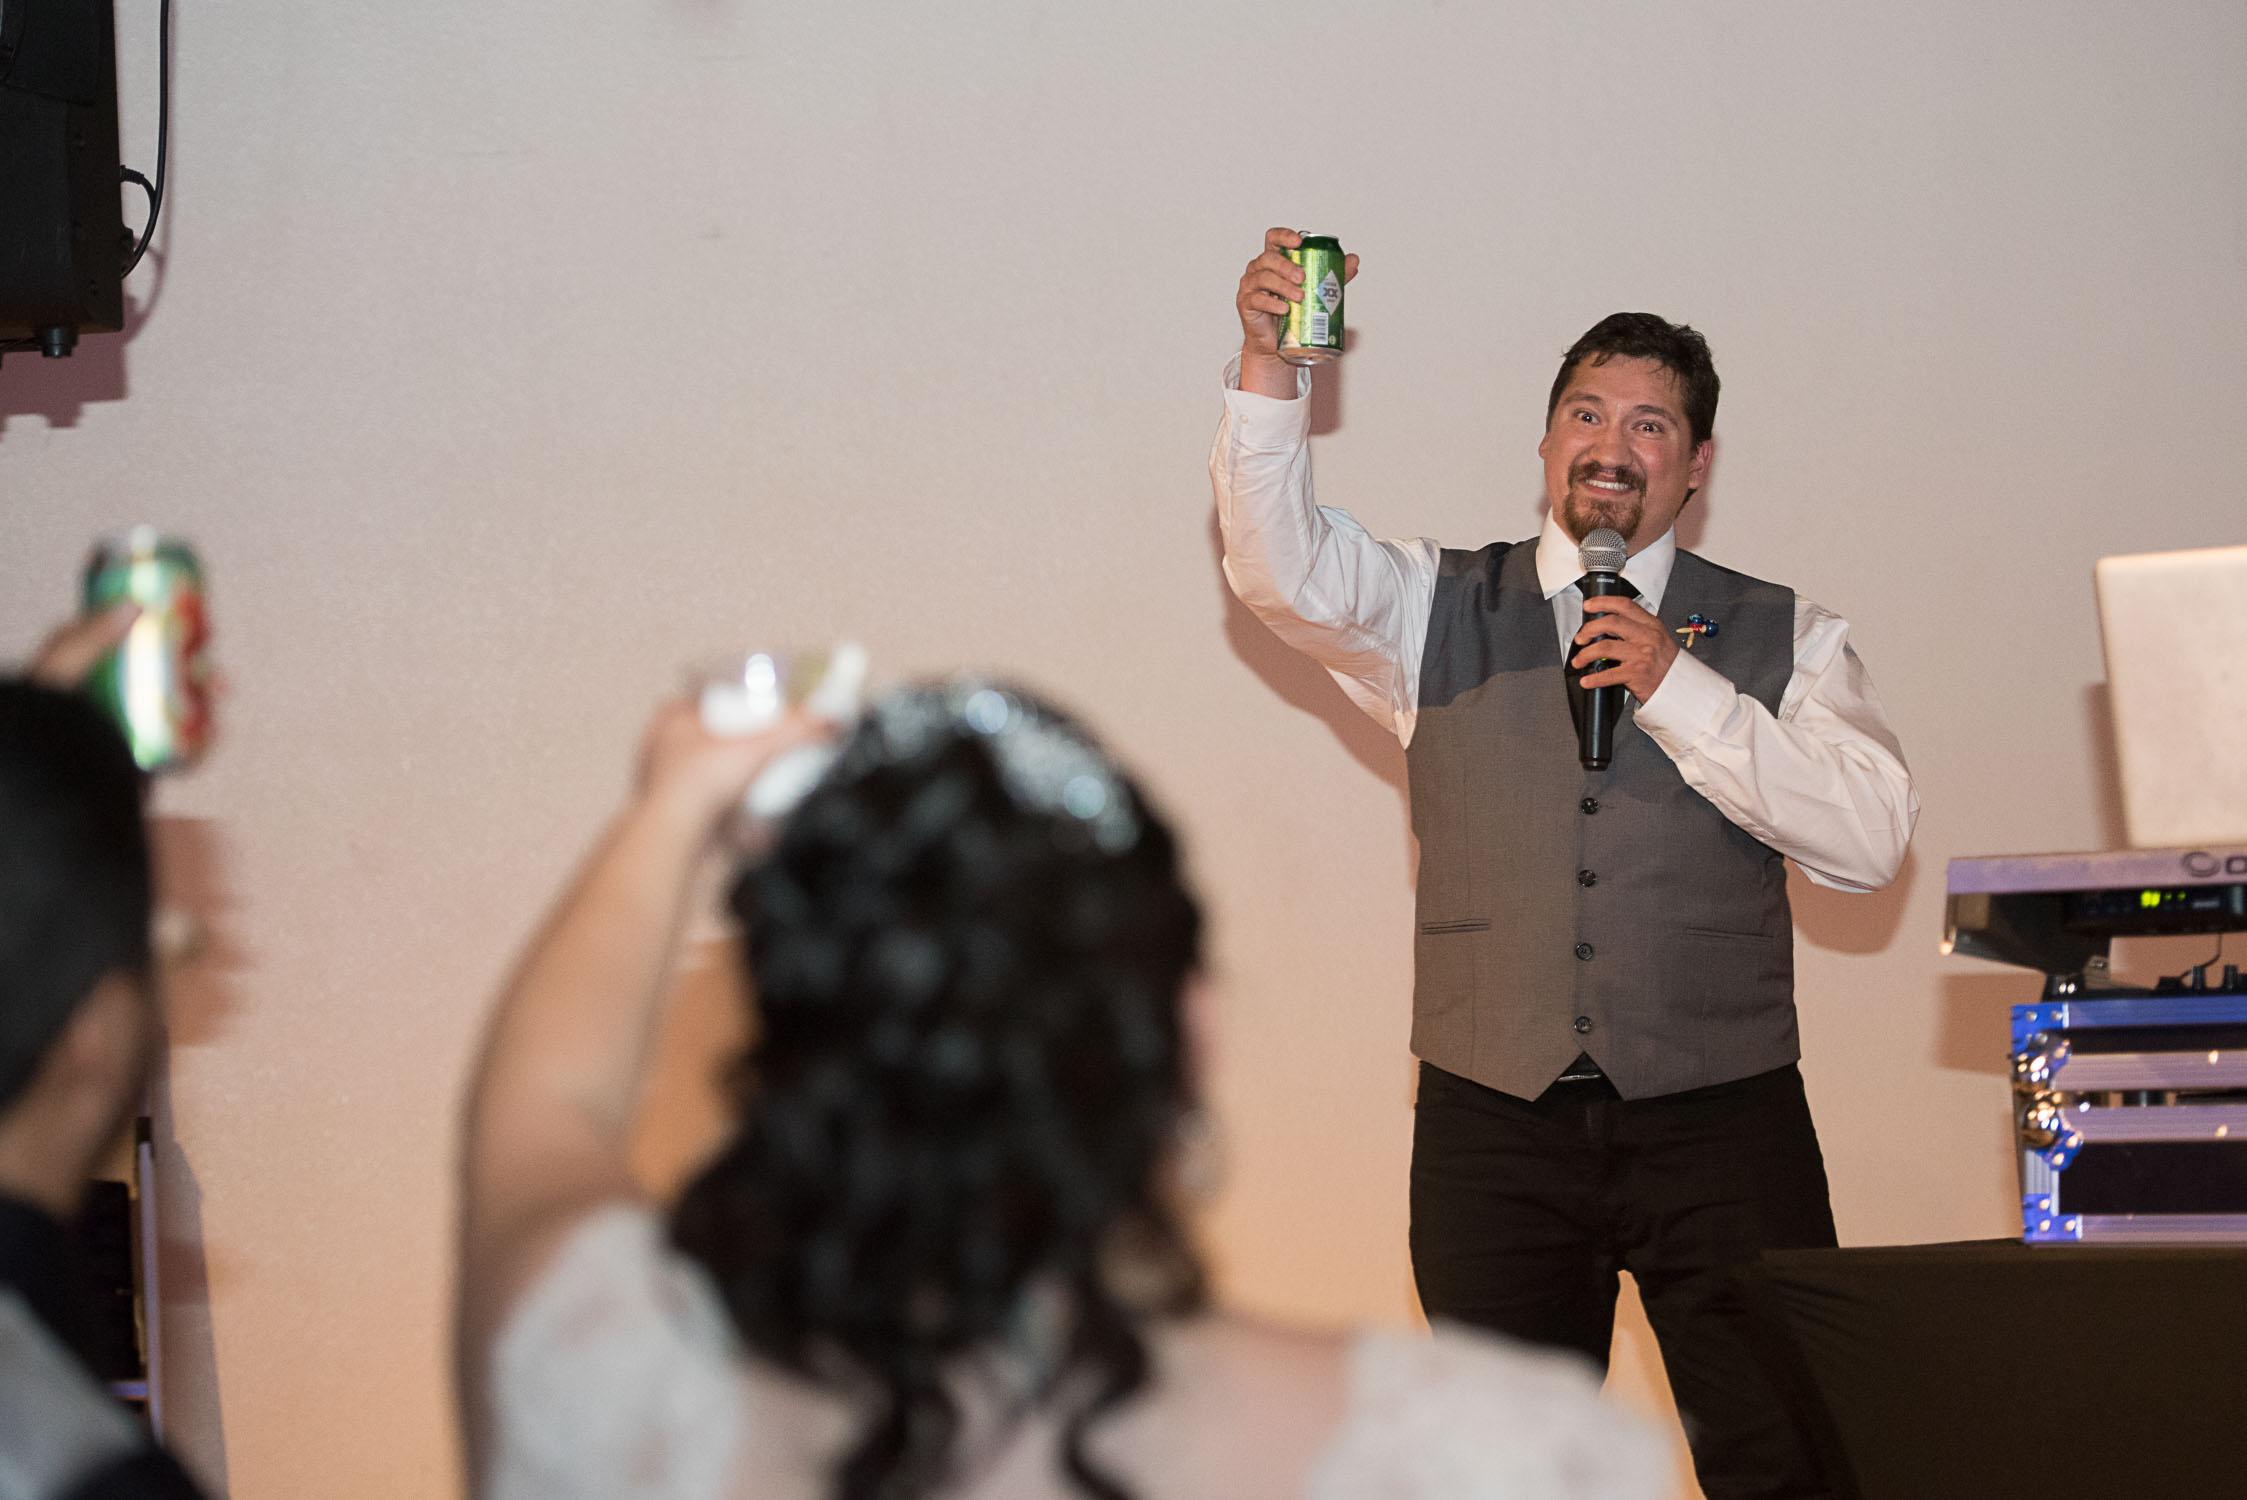 Leal Wedding Mira Visu Photography-159.jpg